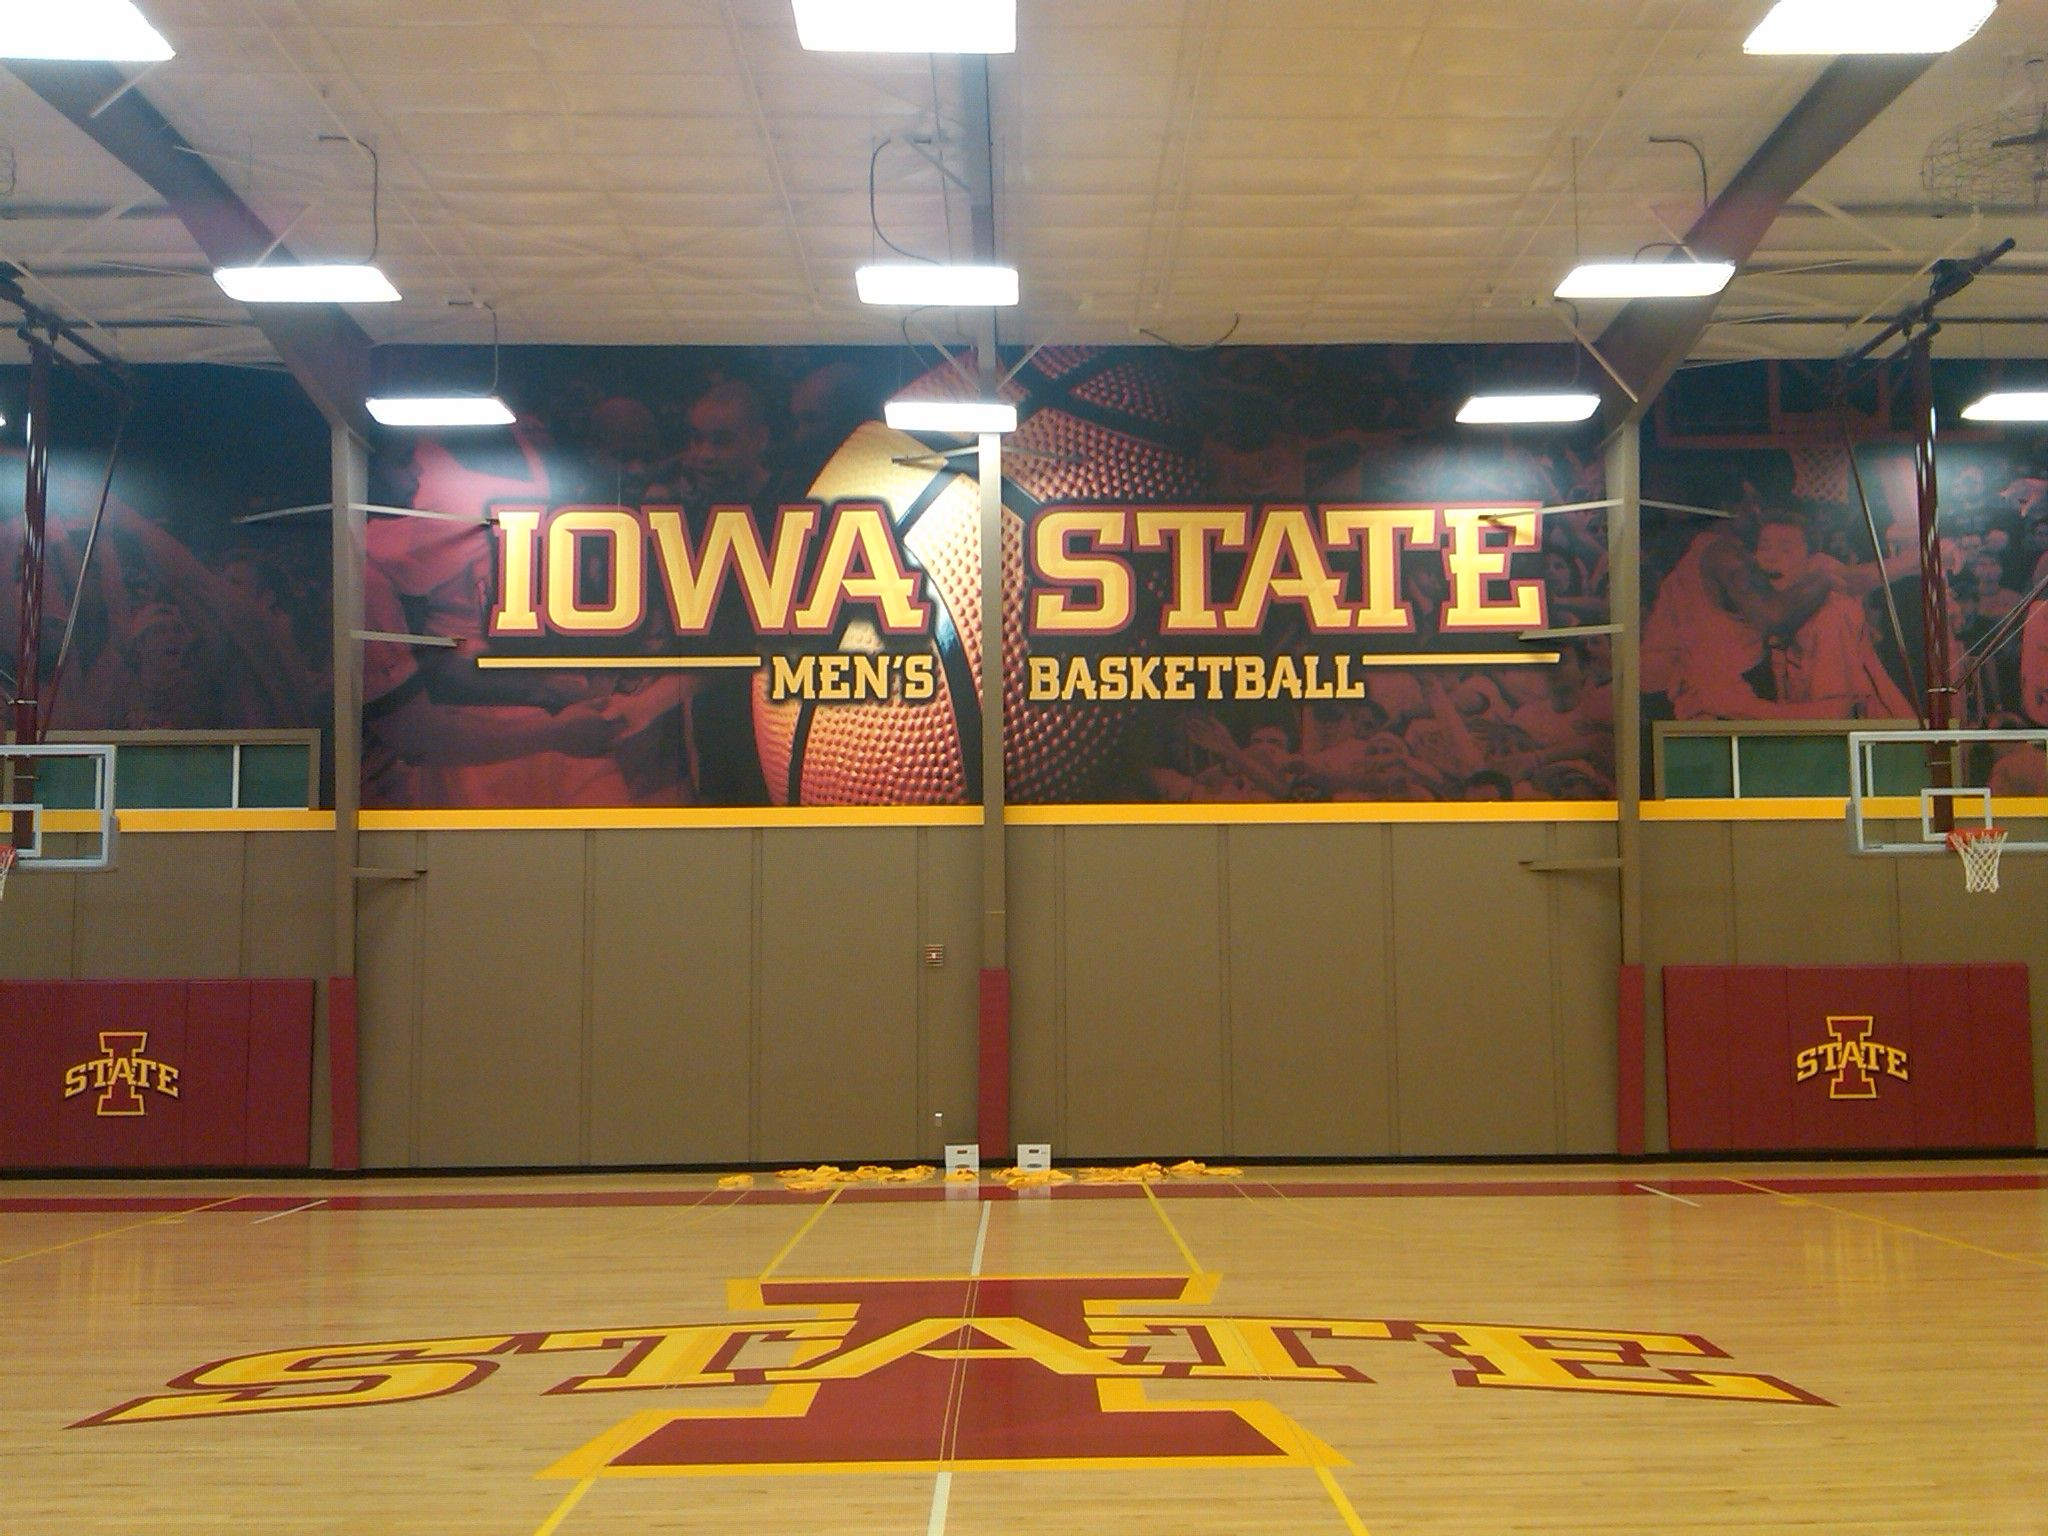 Training Facility For Isu Basketball Isu Basketball Iowa State Basketball